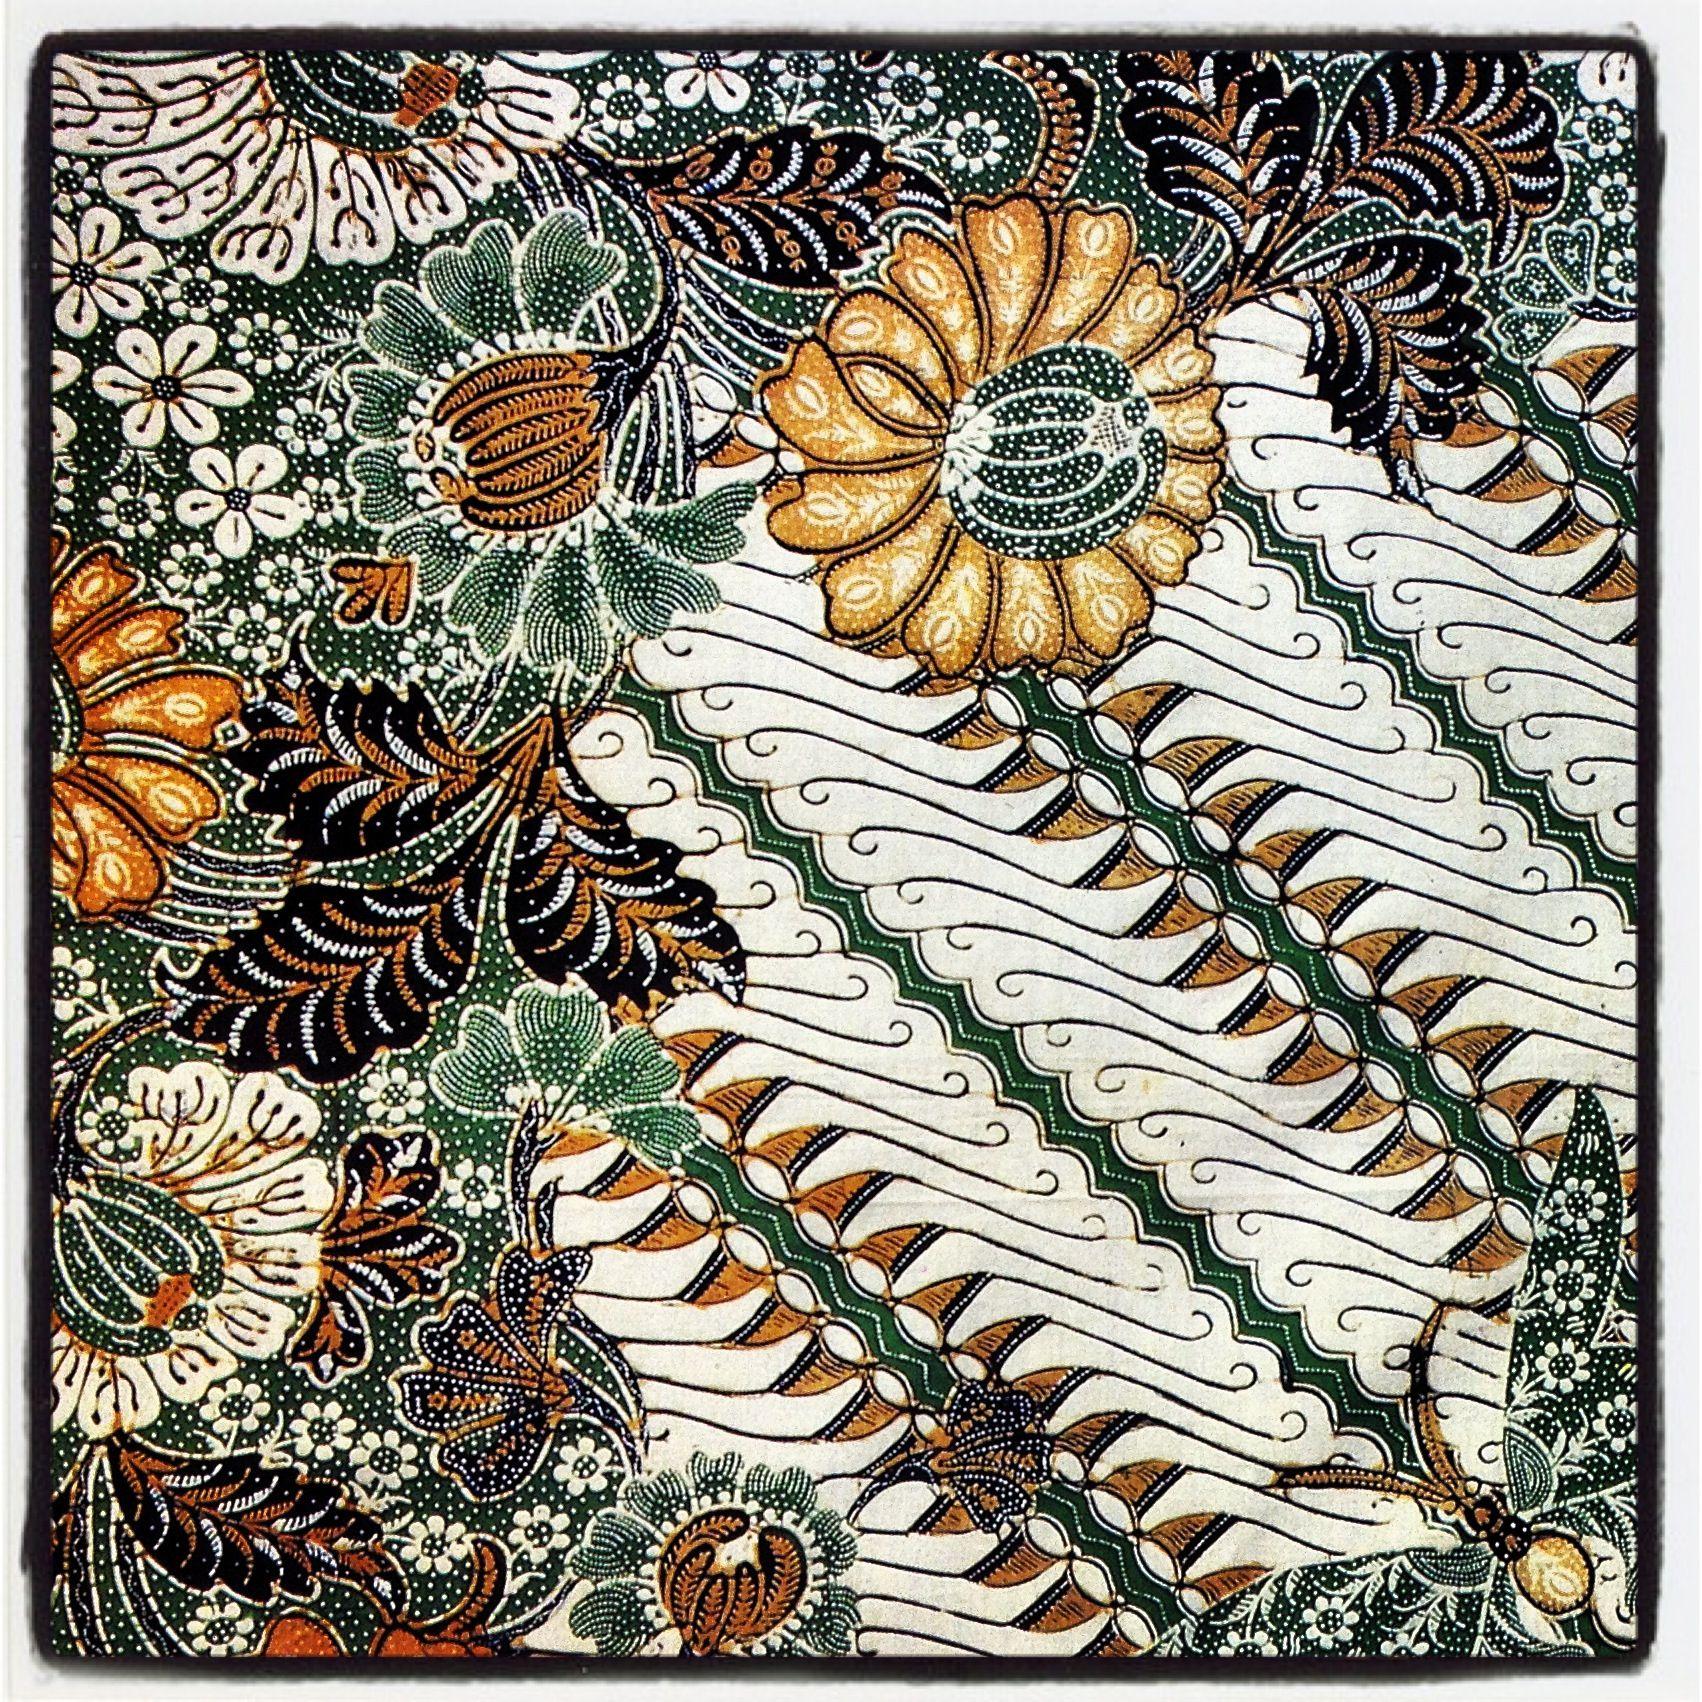 PARANG WENANG BUKETAN Batik From Yogyakarta, Indonesia